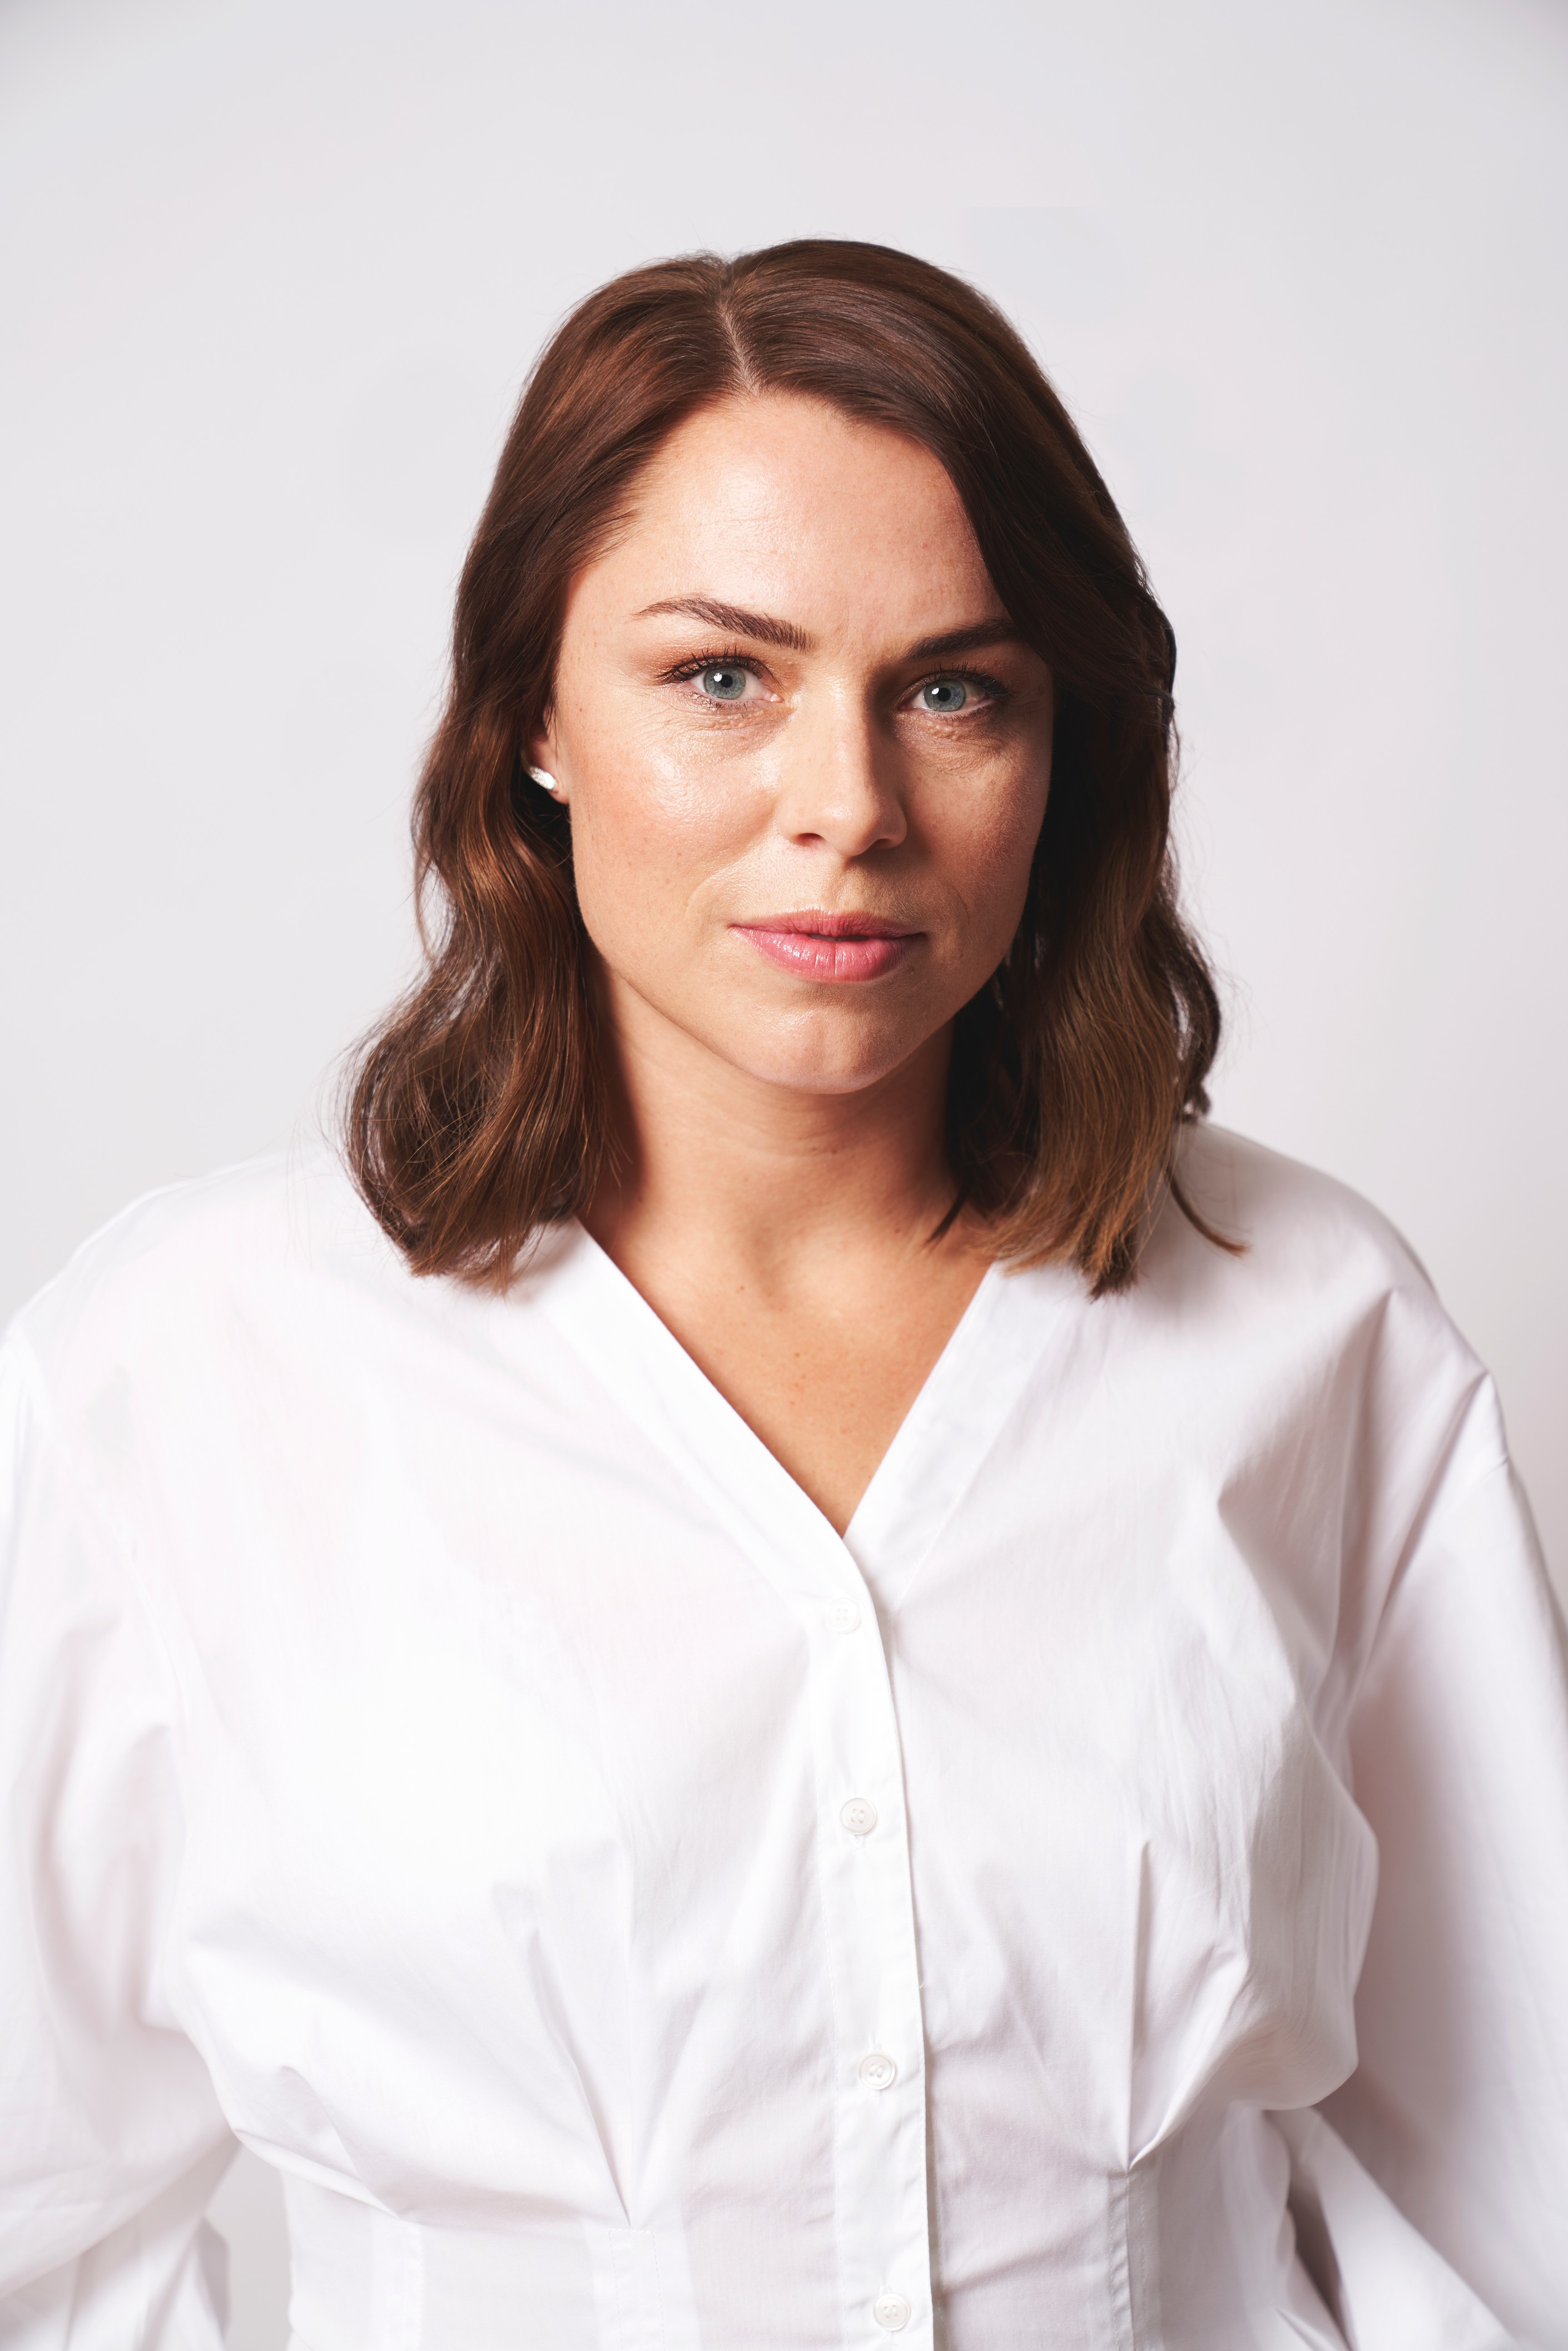 Josefin Landgard